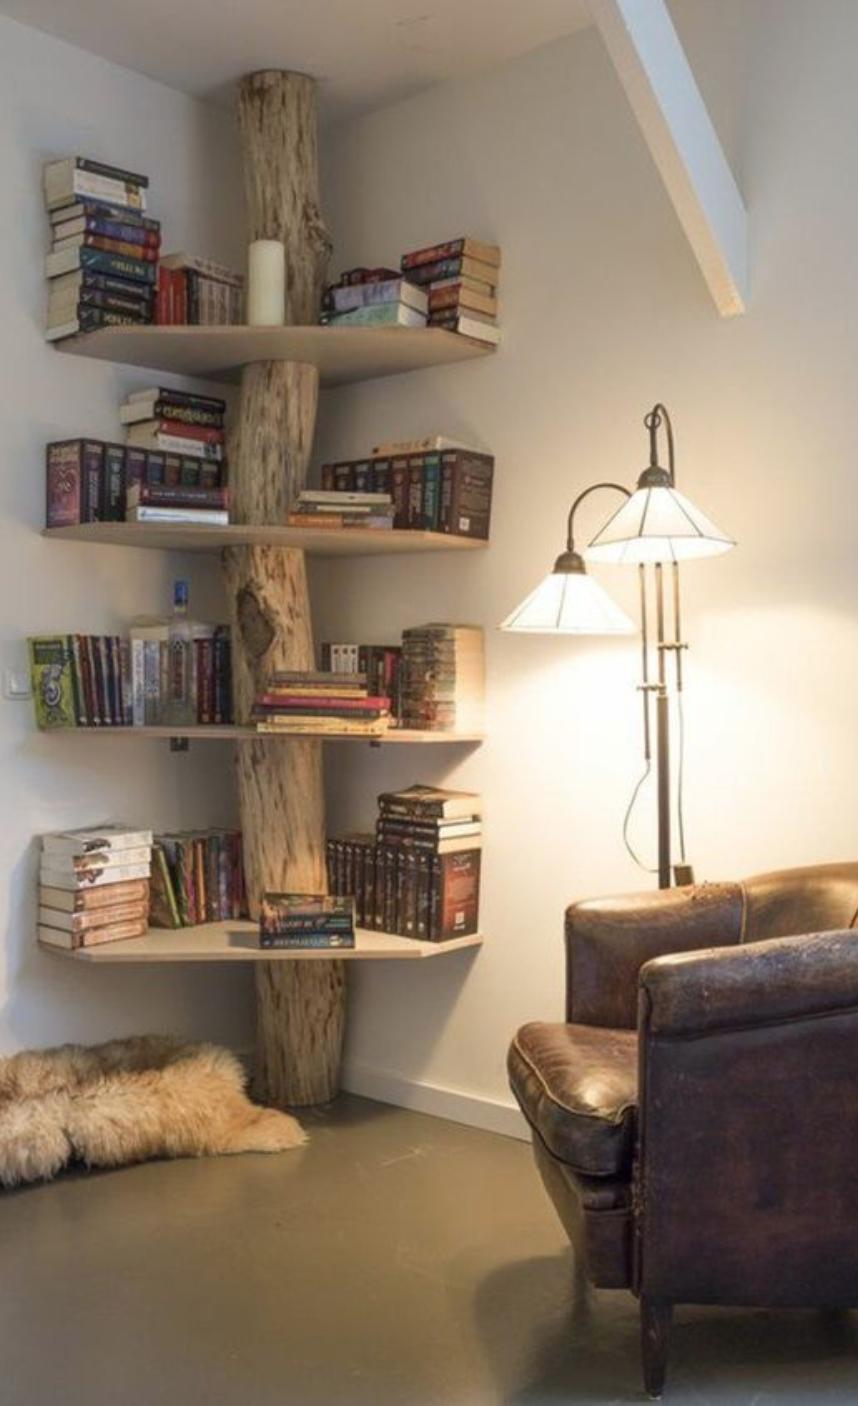 living room, wooden floor, white wall, corner wooden curved shelves, wooden branch